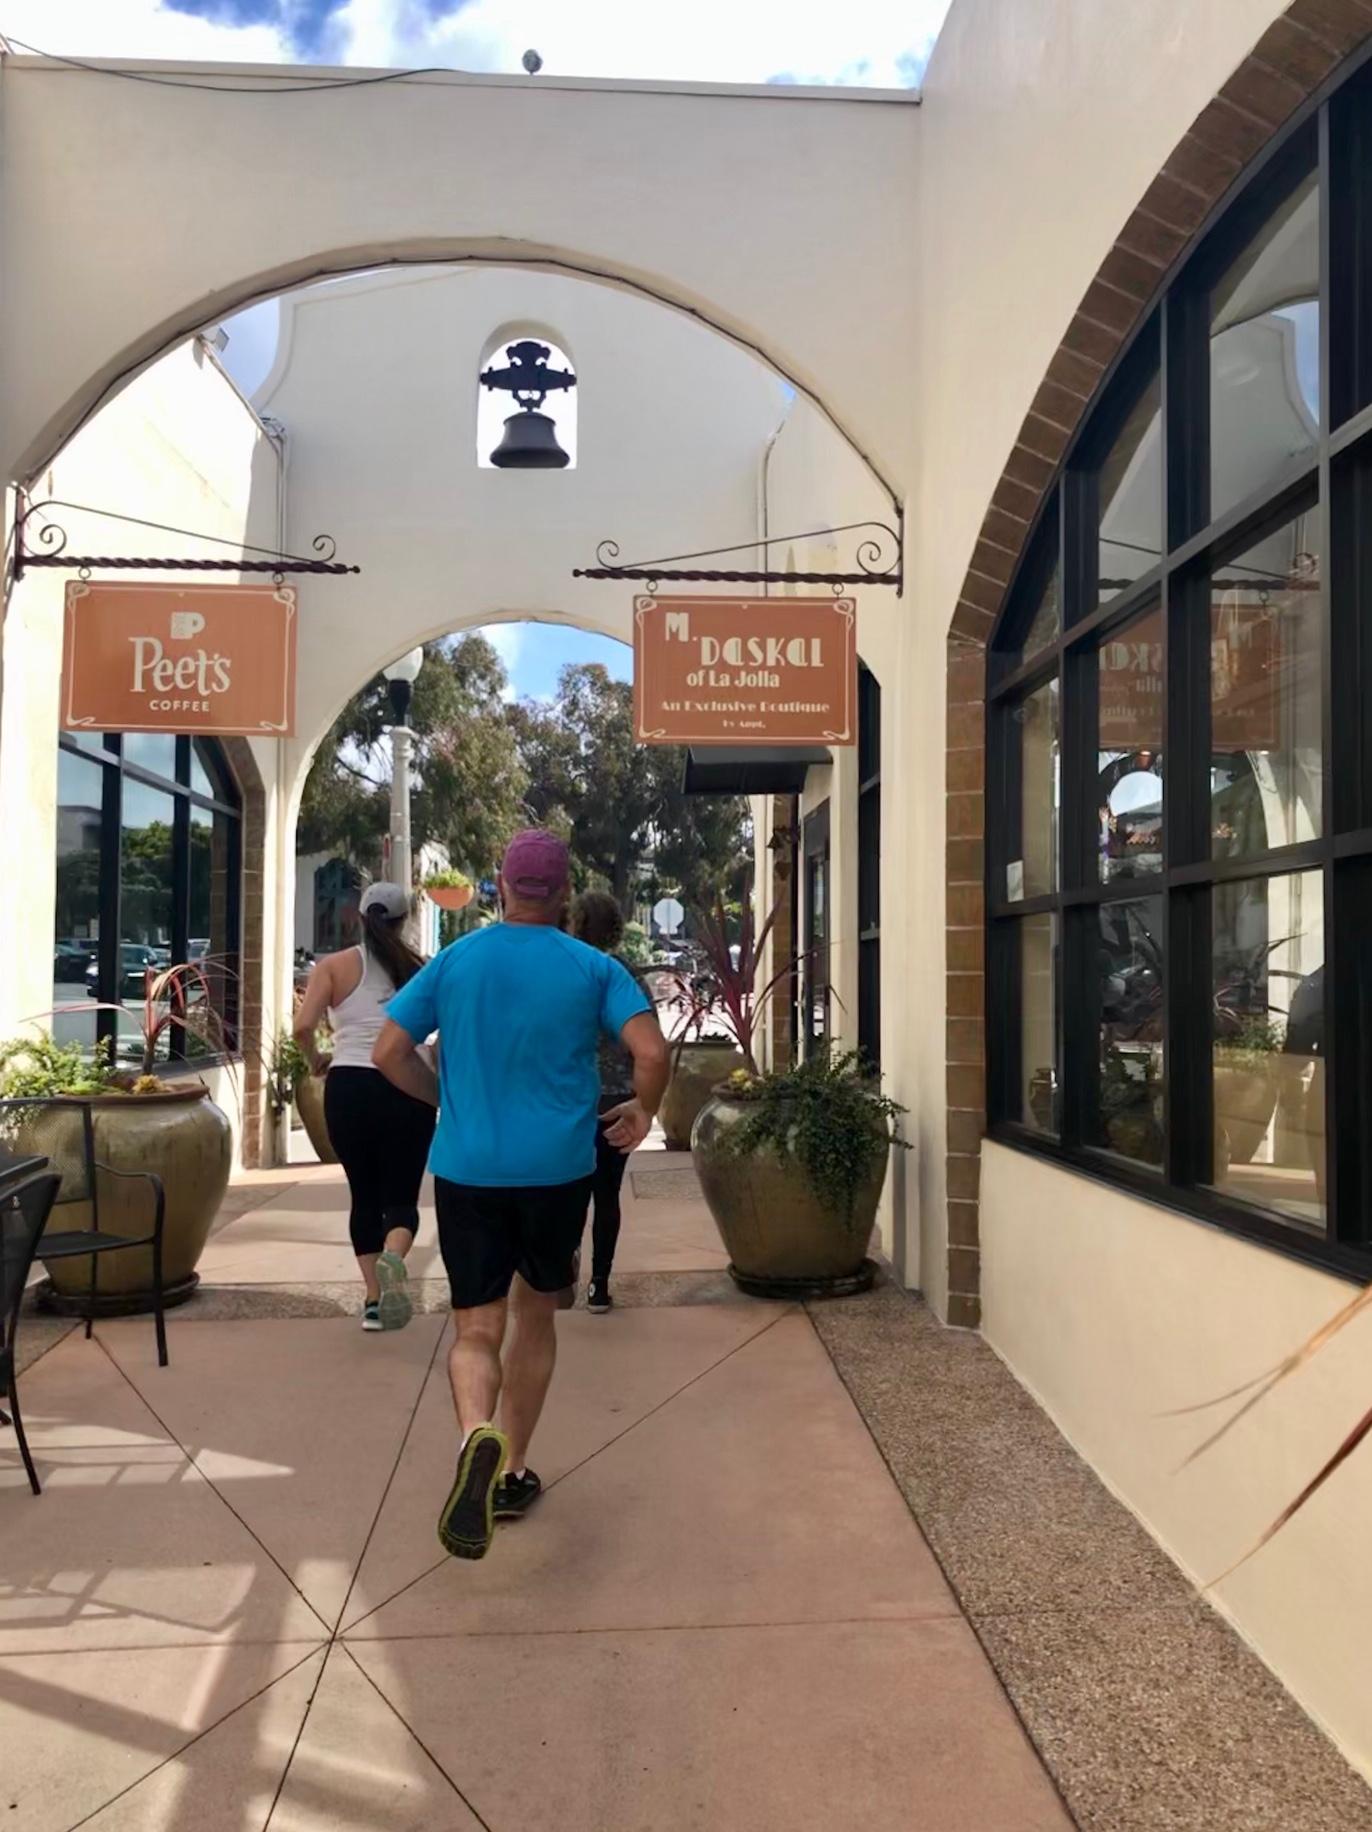 running tour La Jolla - arcade building